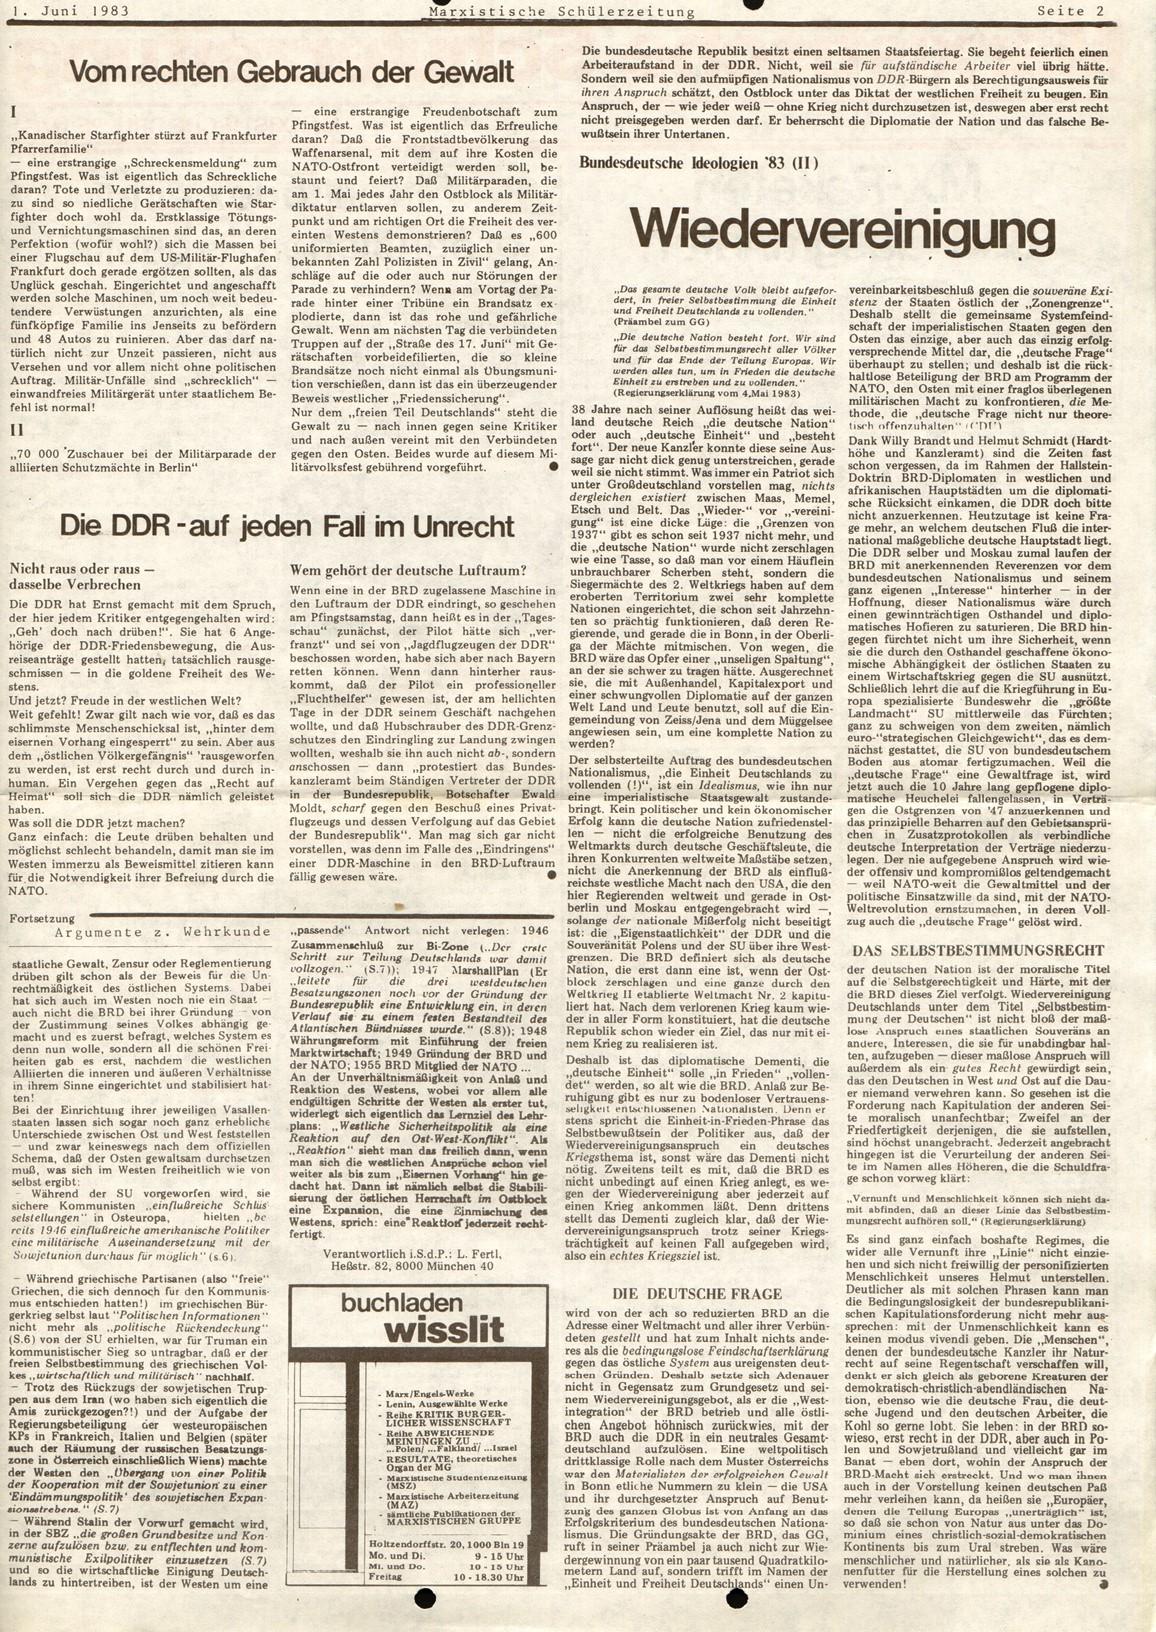 Berlin_MG_Marxistische_Schuelerzeitung_19830601_02